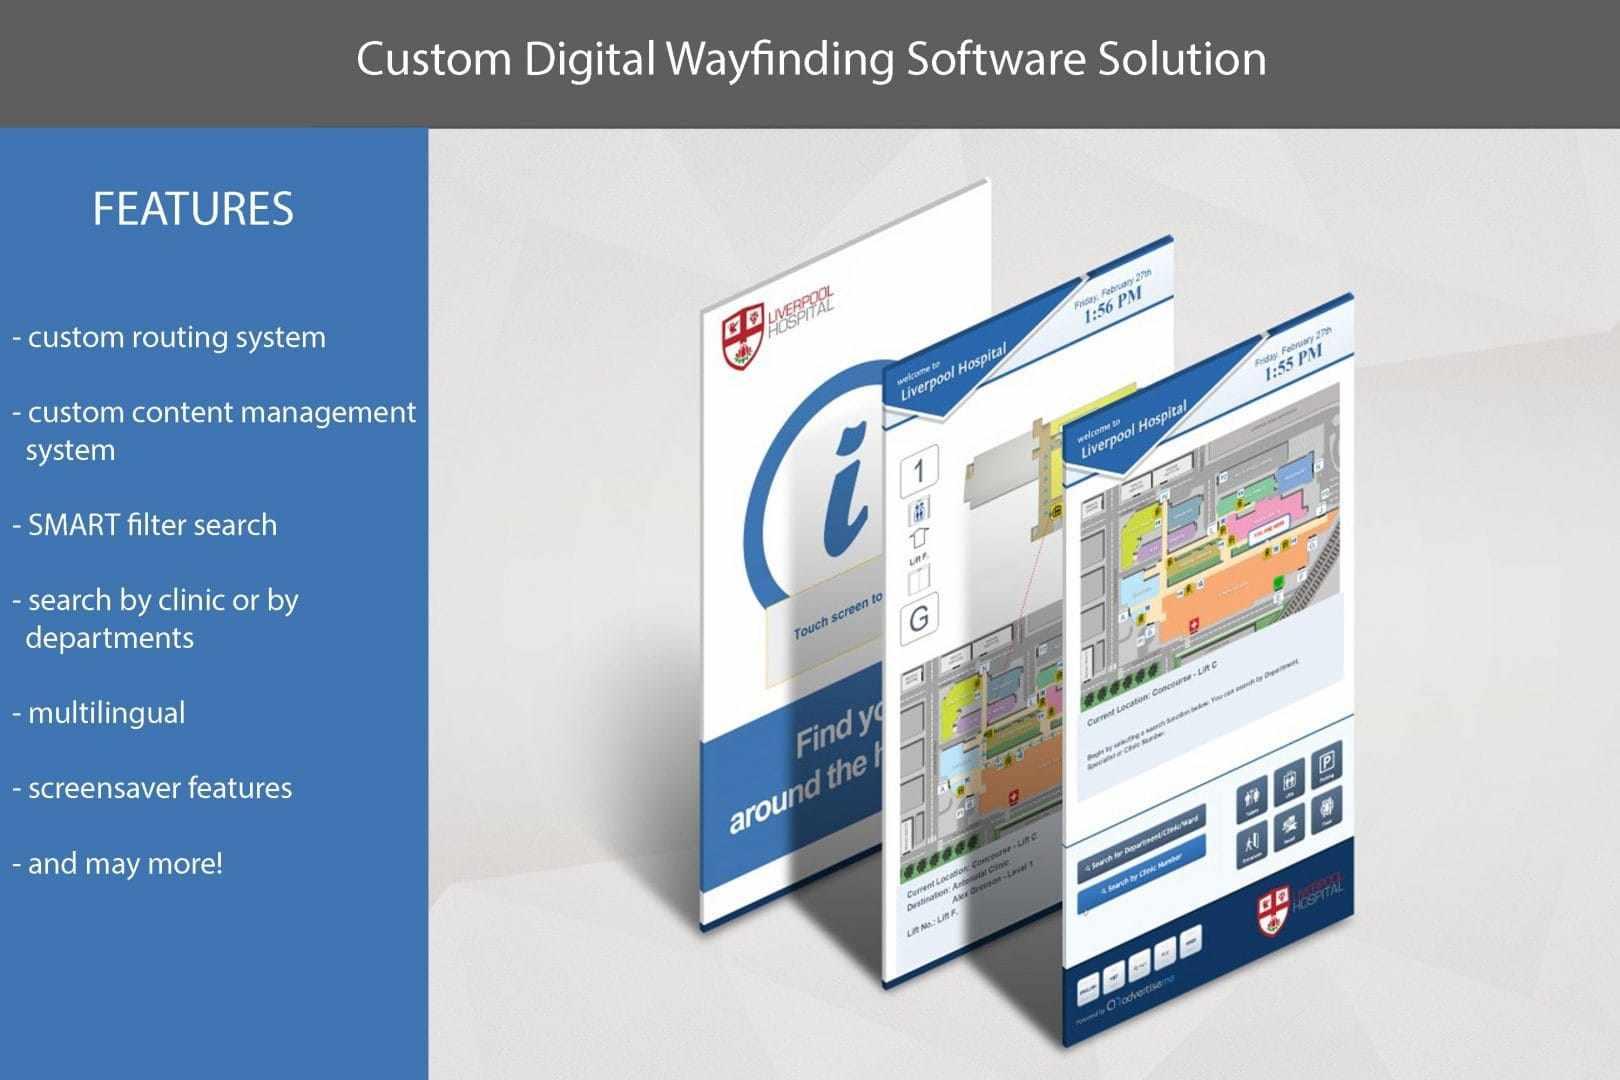 Marco Tran The Simple Entrepreneur Digital Wayfinding Software